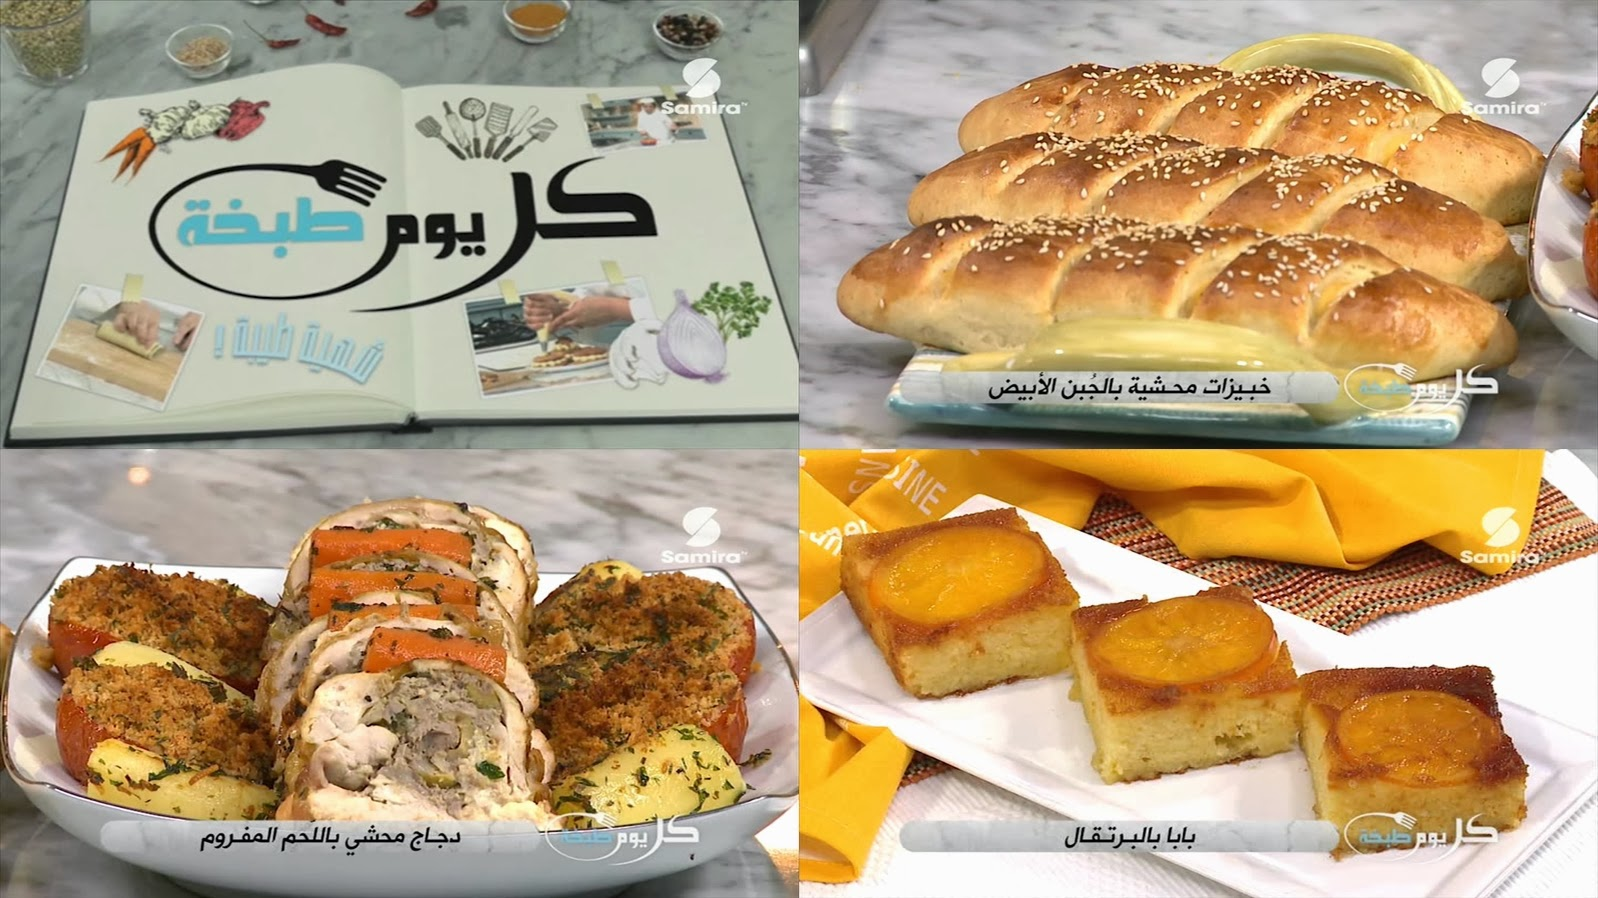 La cuisine alg rienne samira tv for Algerienne cuisine